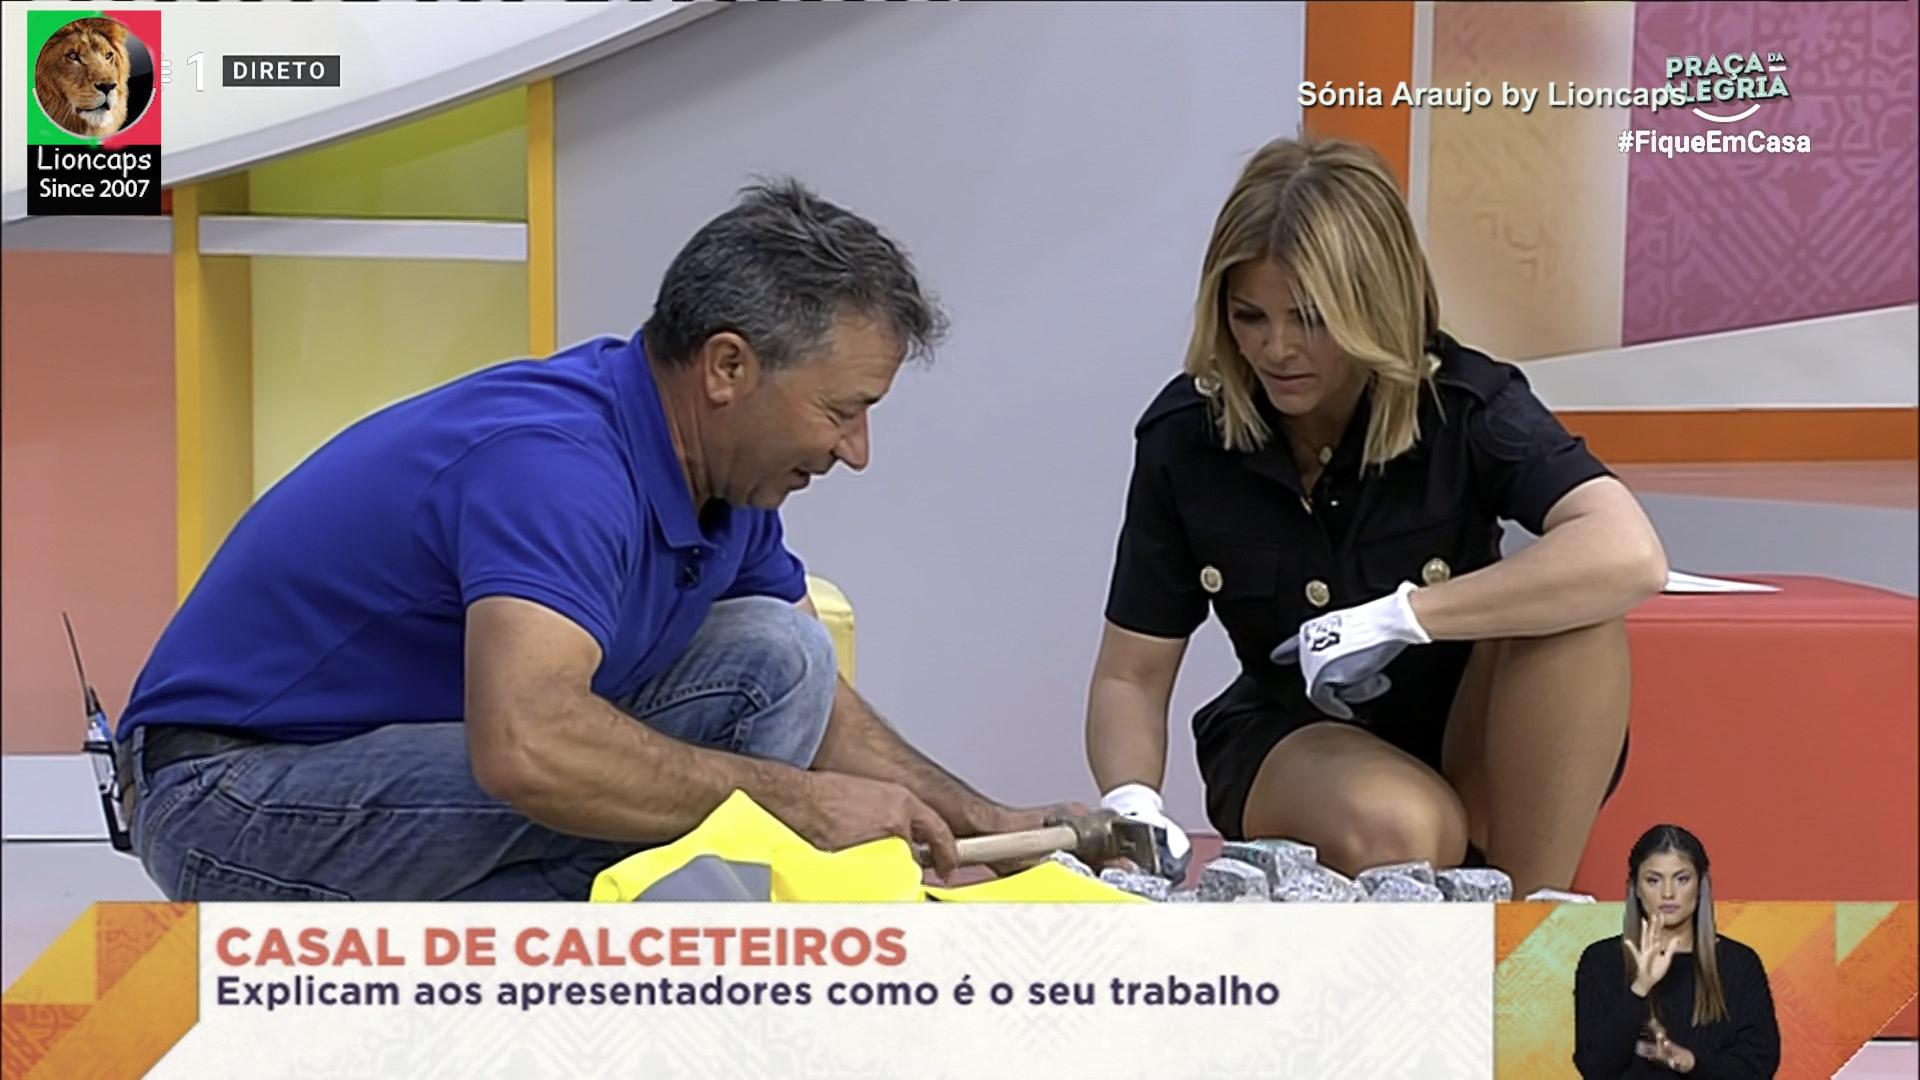 sonia_araujo_praca_lioncaps_11_04_2021 (6).jpg